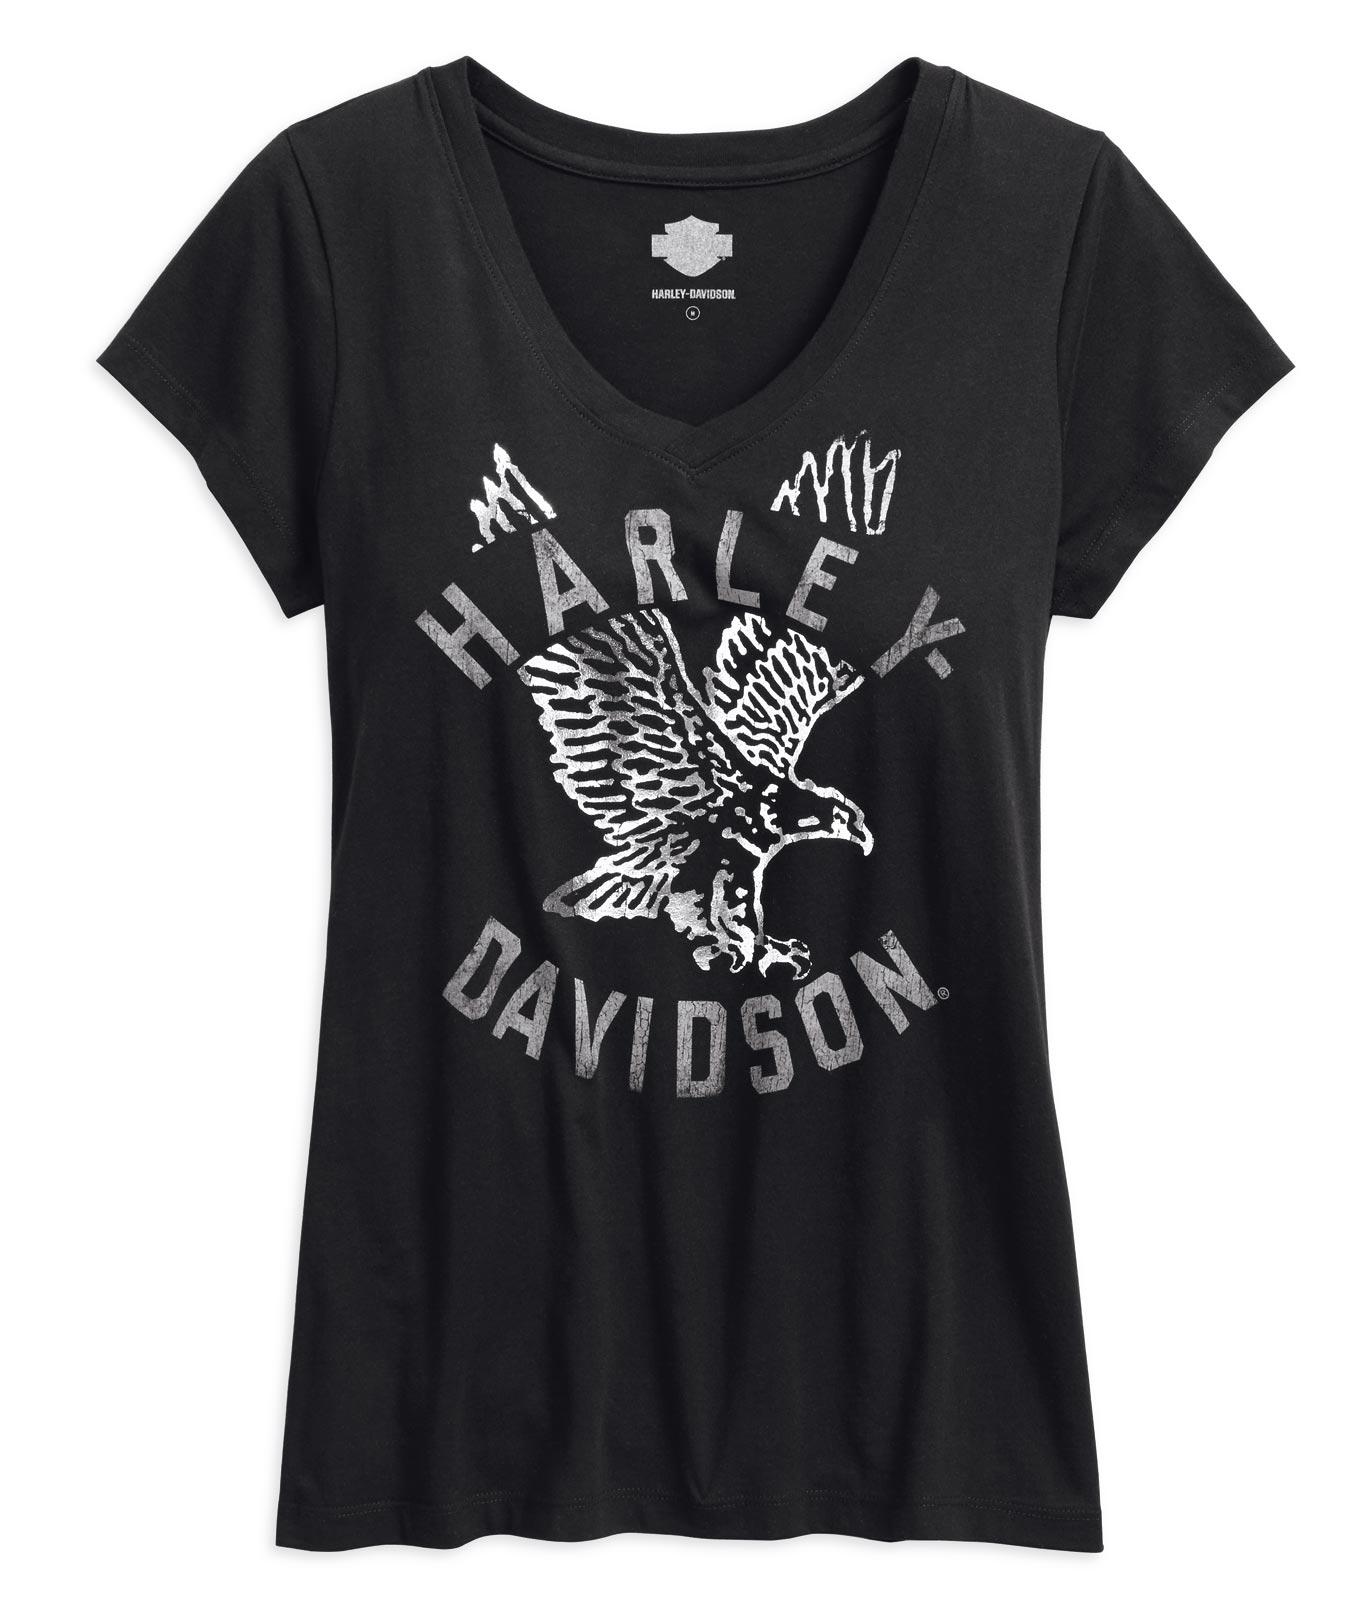 In shirts bulk t harley fit slim davidson nordstrom